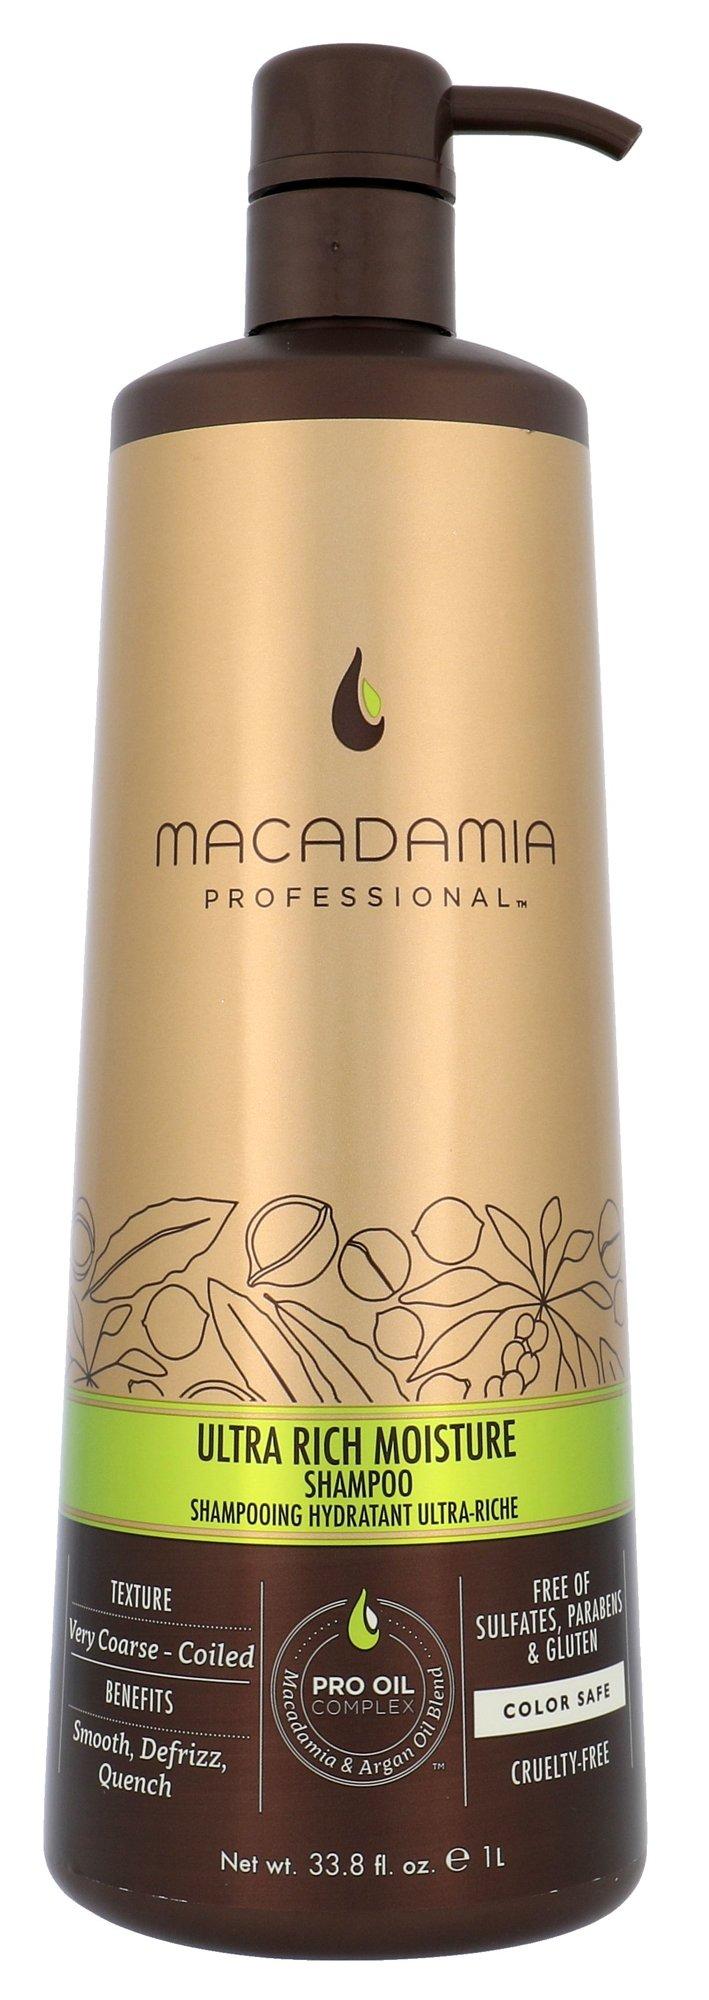 Macadamia Ultra Rich Moisture Shampoo Cosmetic 1000ml